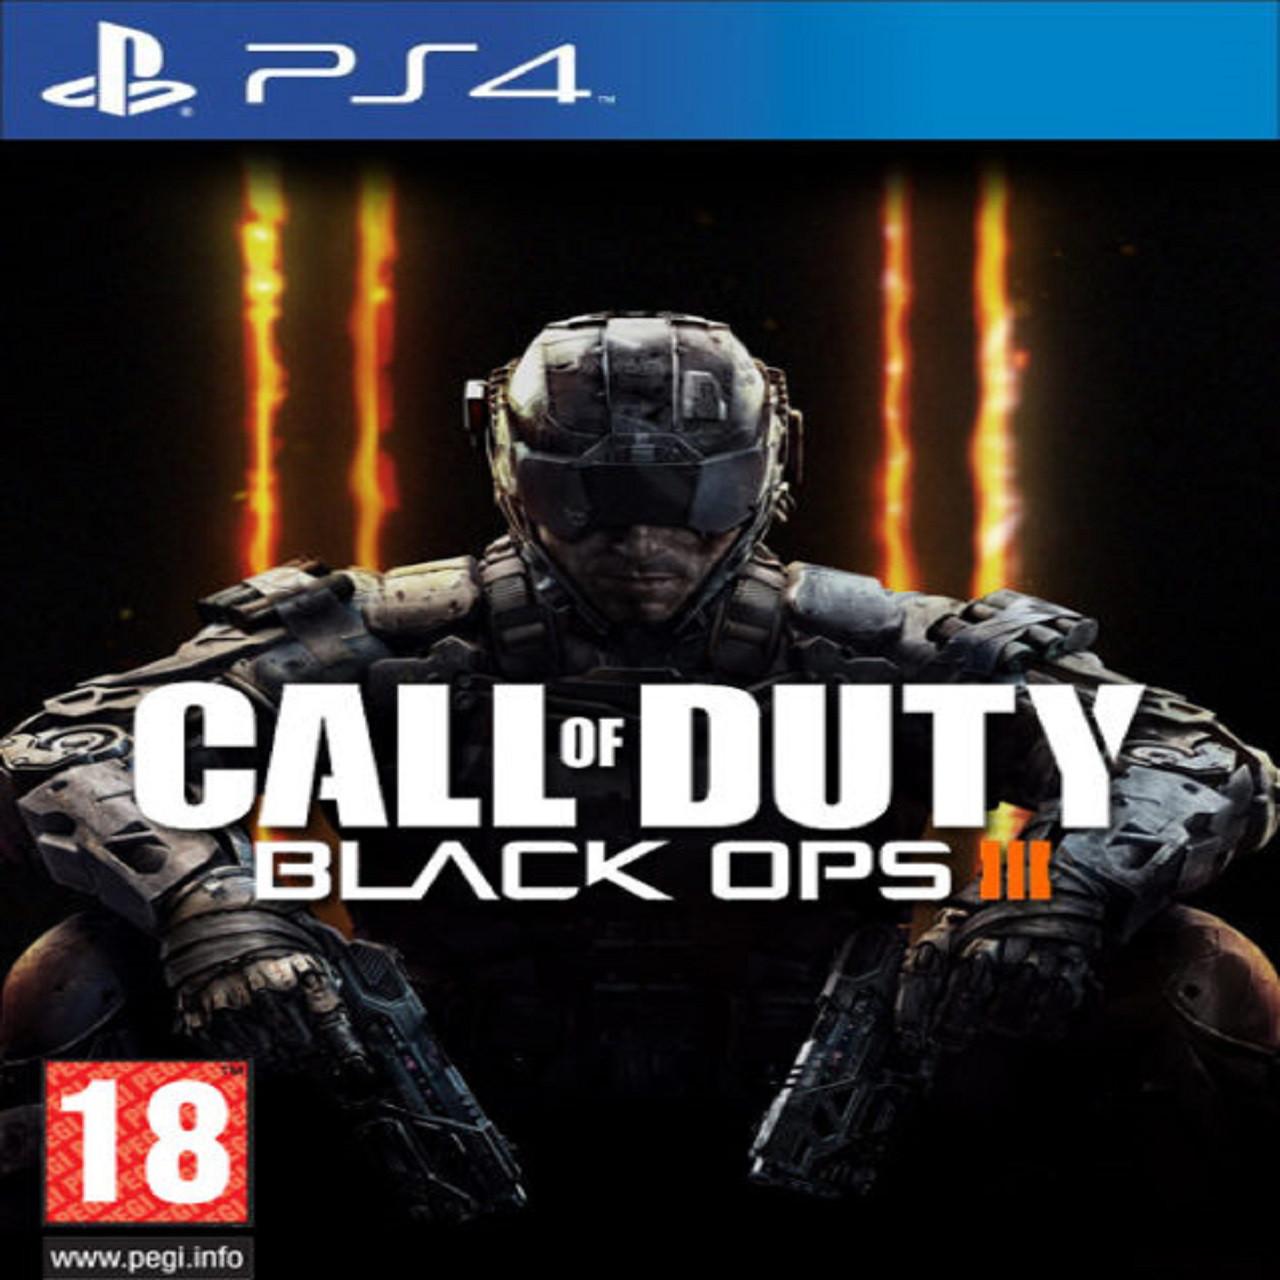 Call of Duty: Black Ops III (английская версия) PS4 (Б/У)